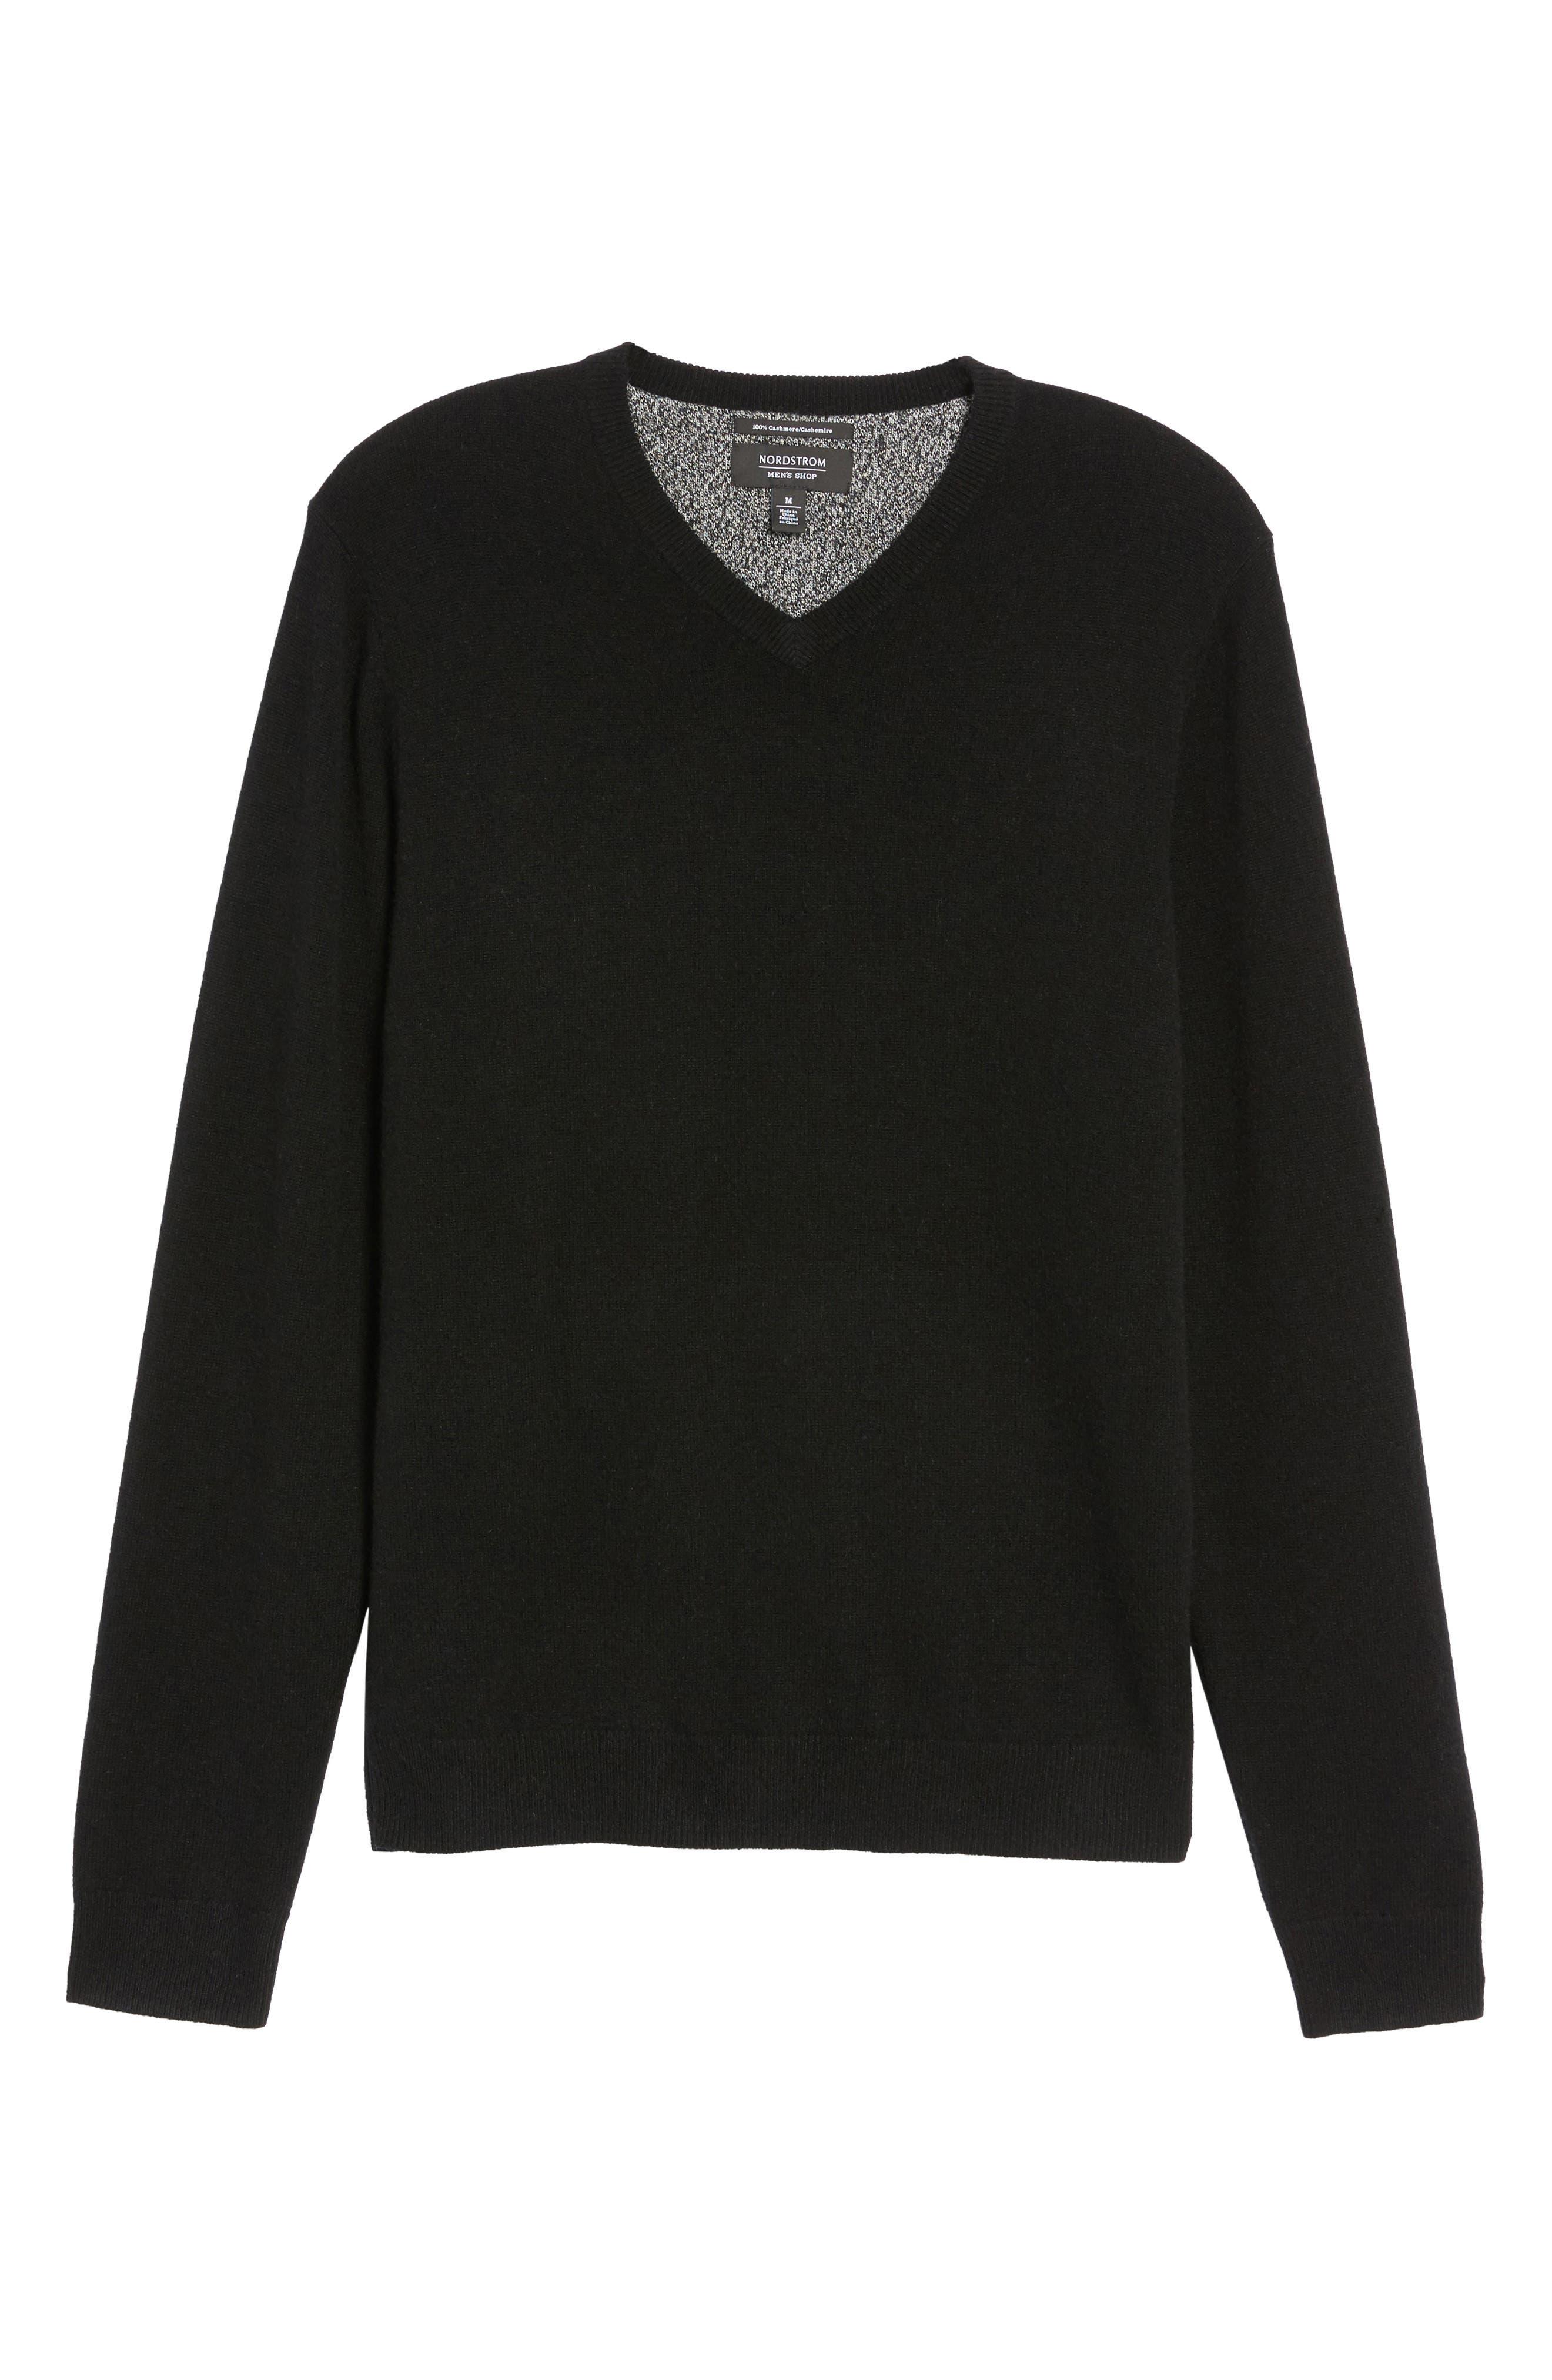 NORDSTROM MEN'S SHOP,                             Cashmere V-Neck Sweater,                             Alternate thumbnail 6, color,                             BLACK CAVIAR